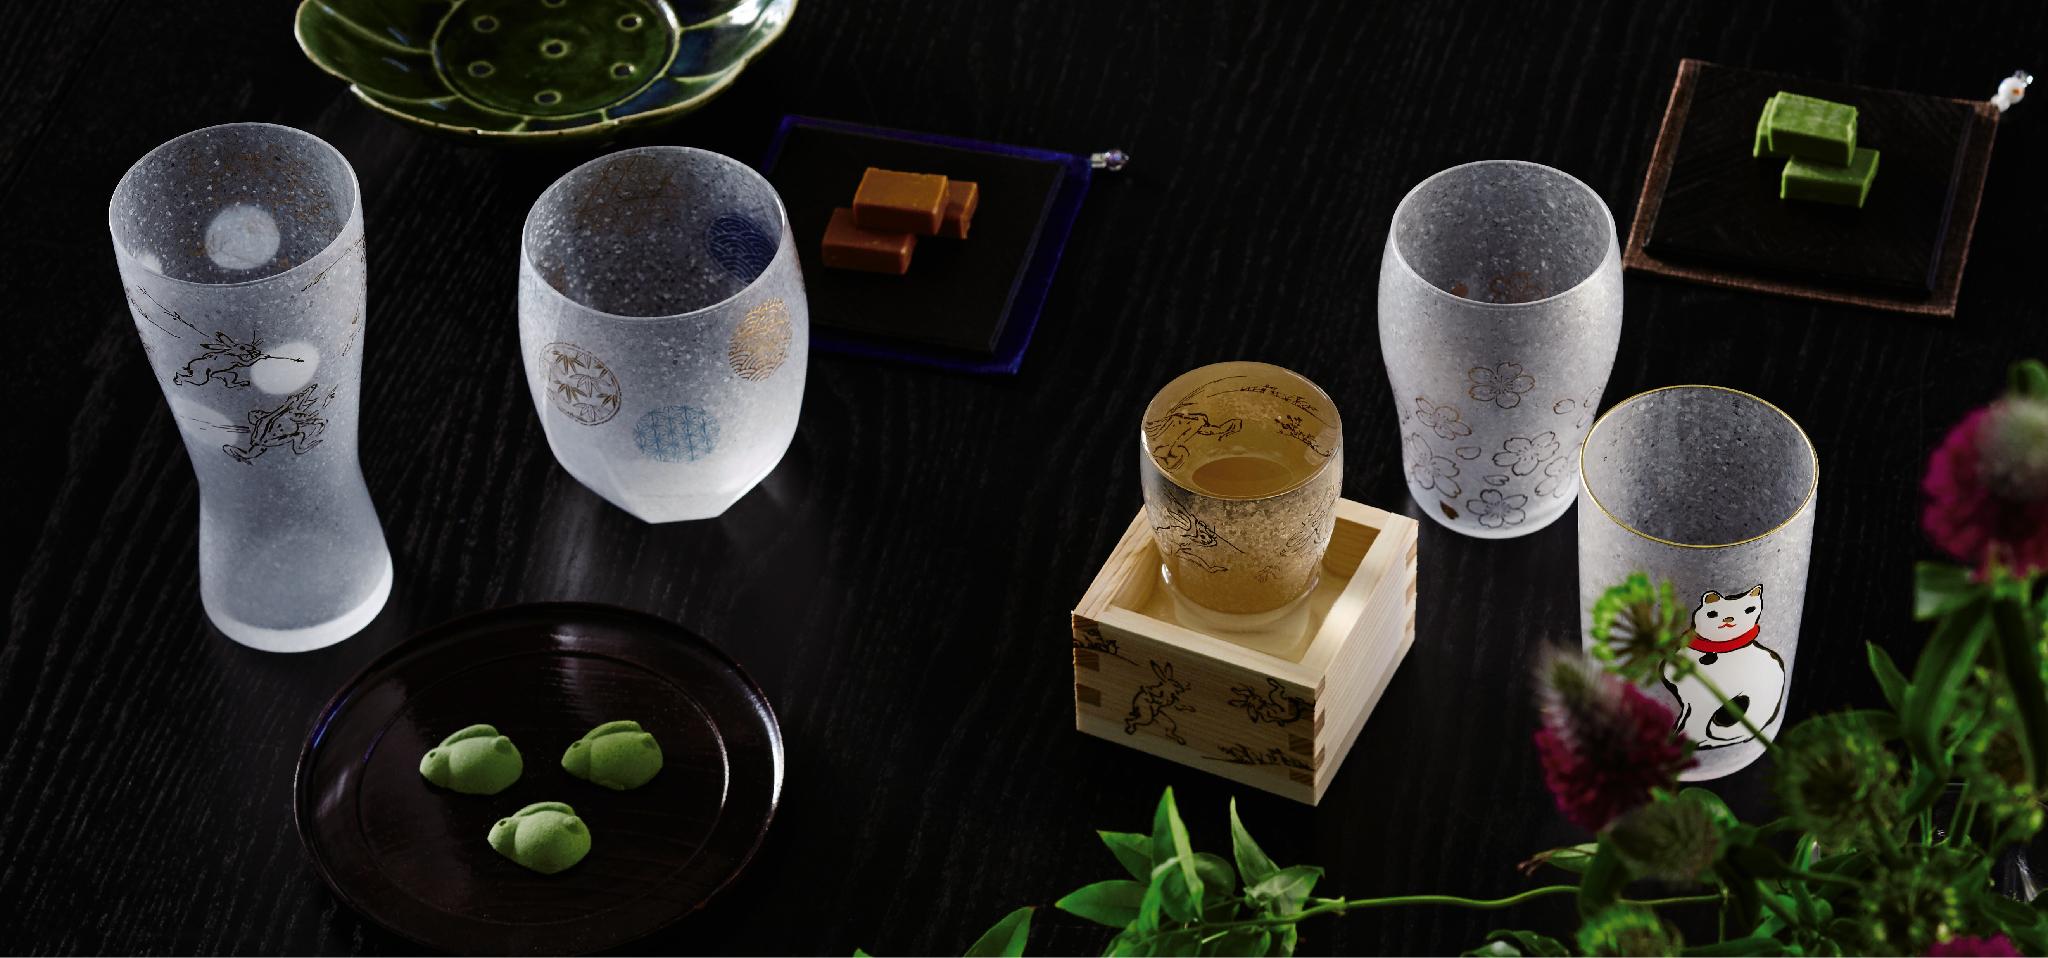 The Premium Nippon Taste|日本製|カラス食器ブランド ADERIA|アデリア